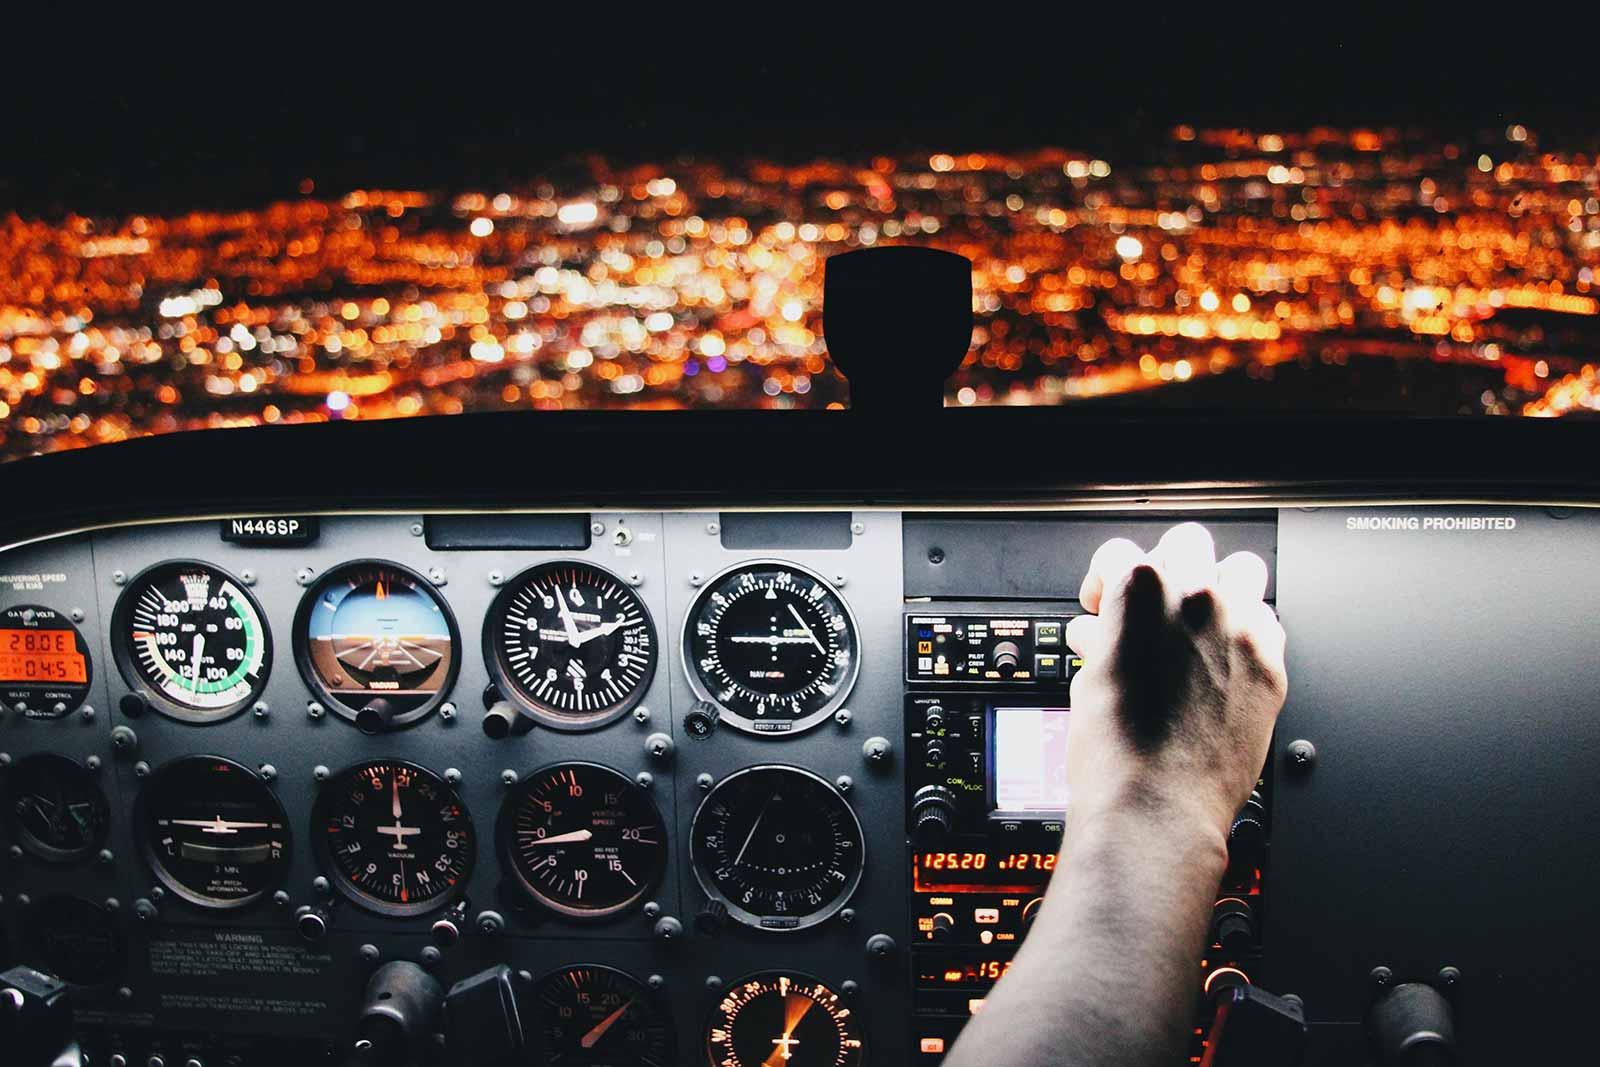 Helikopter-selber-fliegen-Mallorca-Flugstunde-Helikopter-1